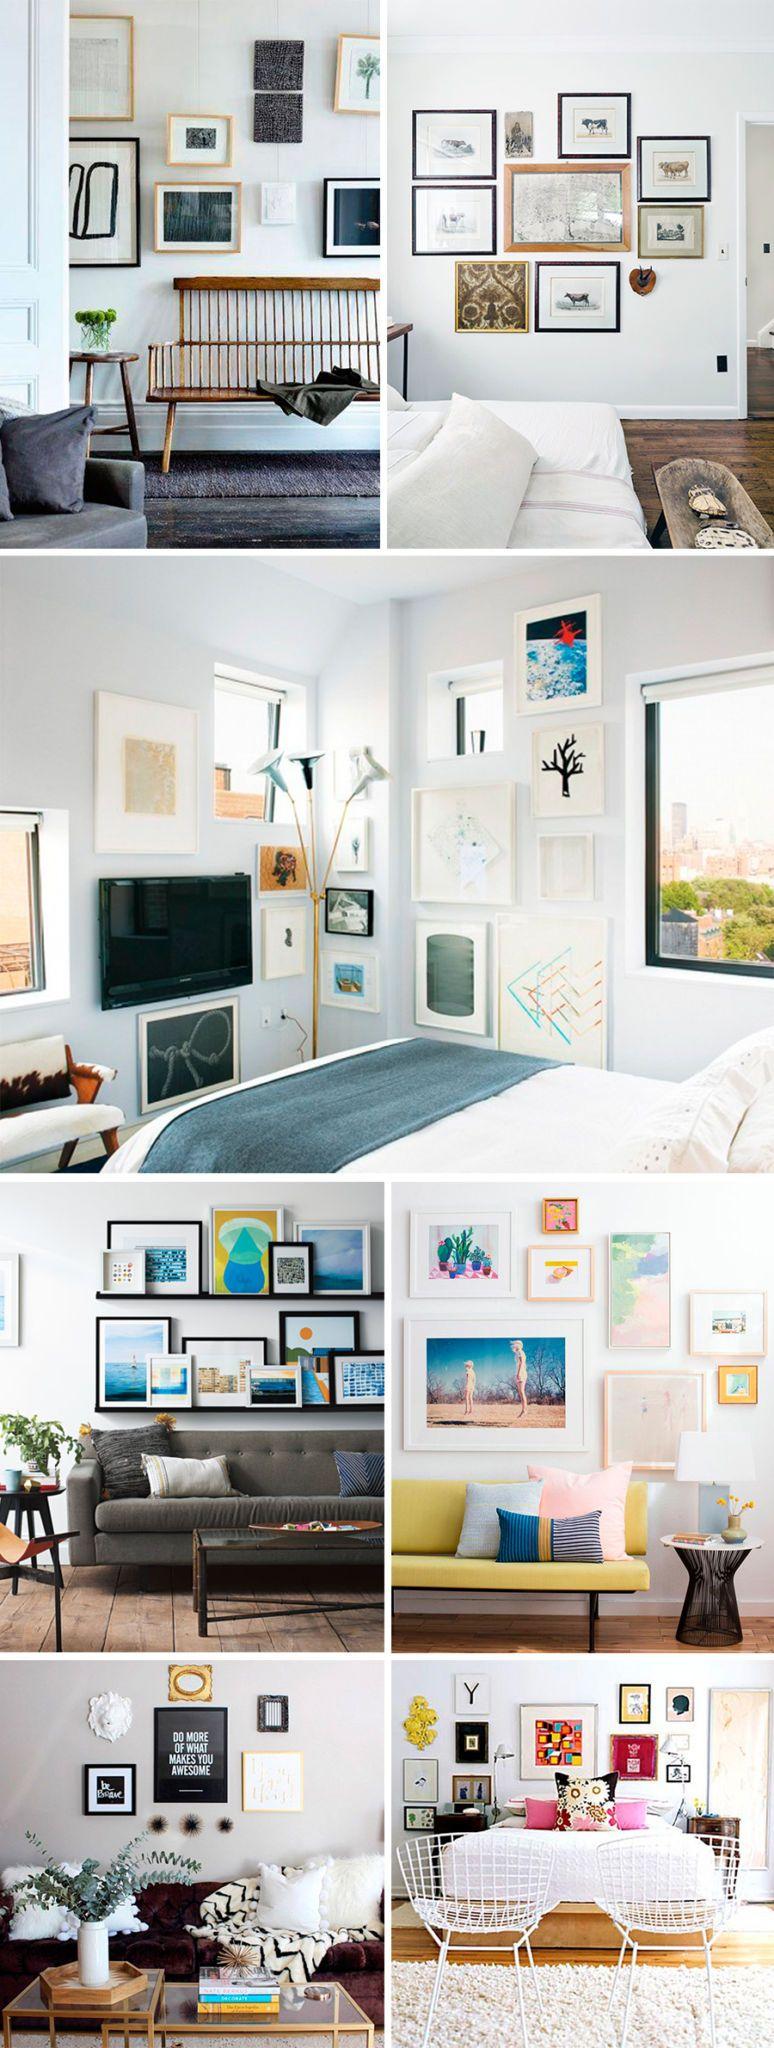 cantinho charmoso gallery wall blog da mariah1